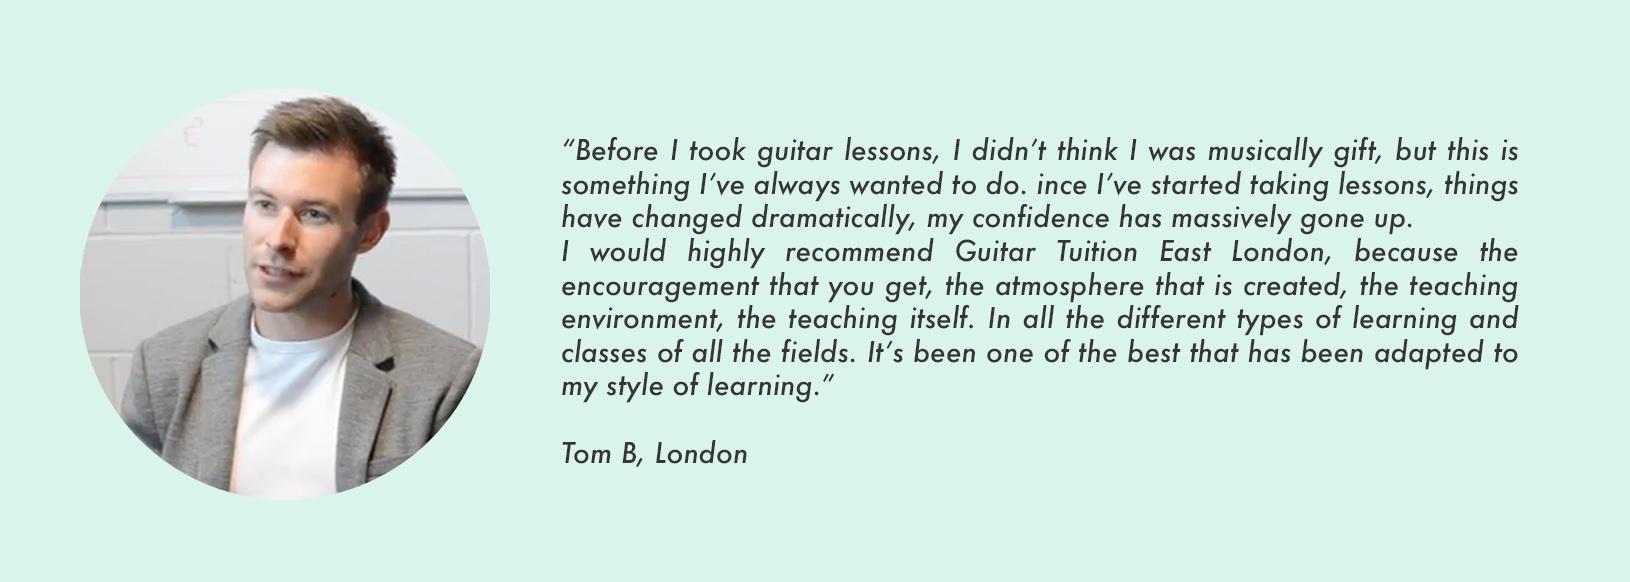 Tom testimonial.jpg